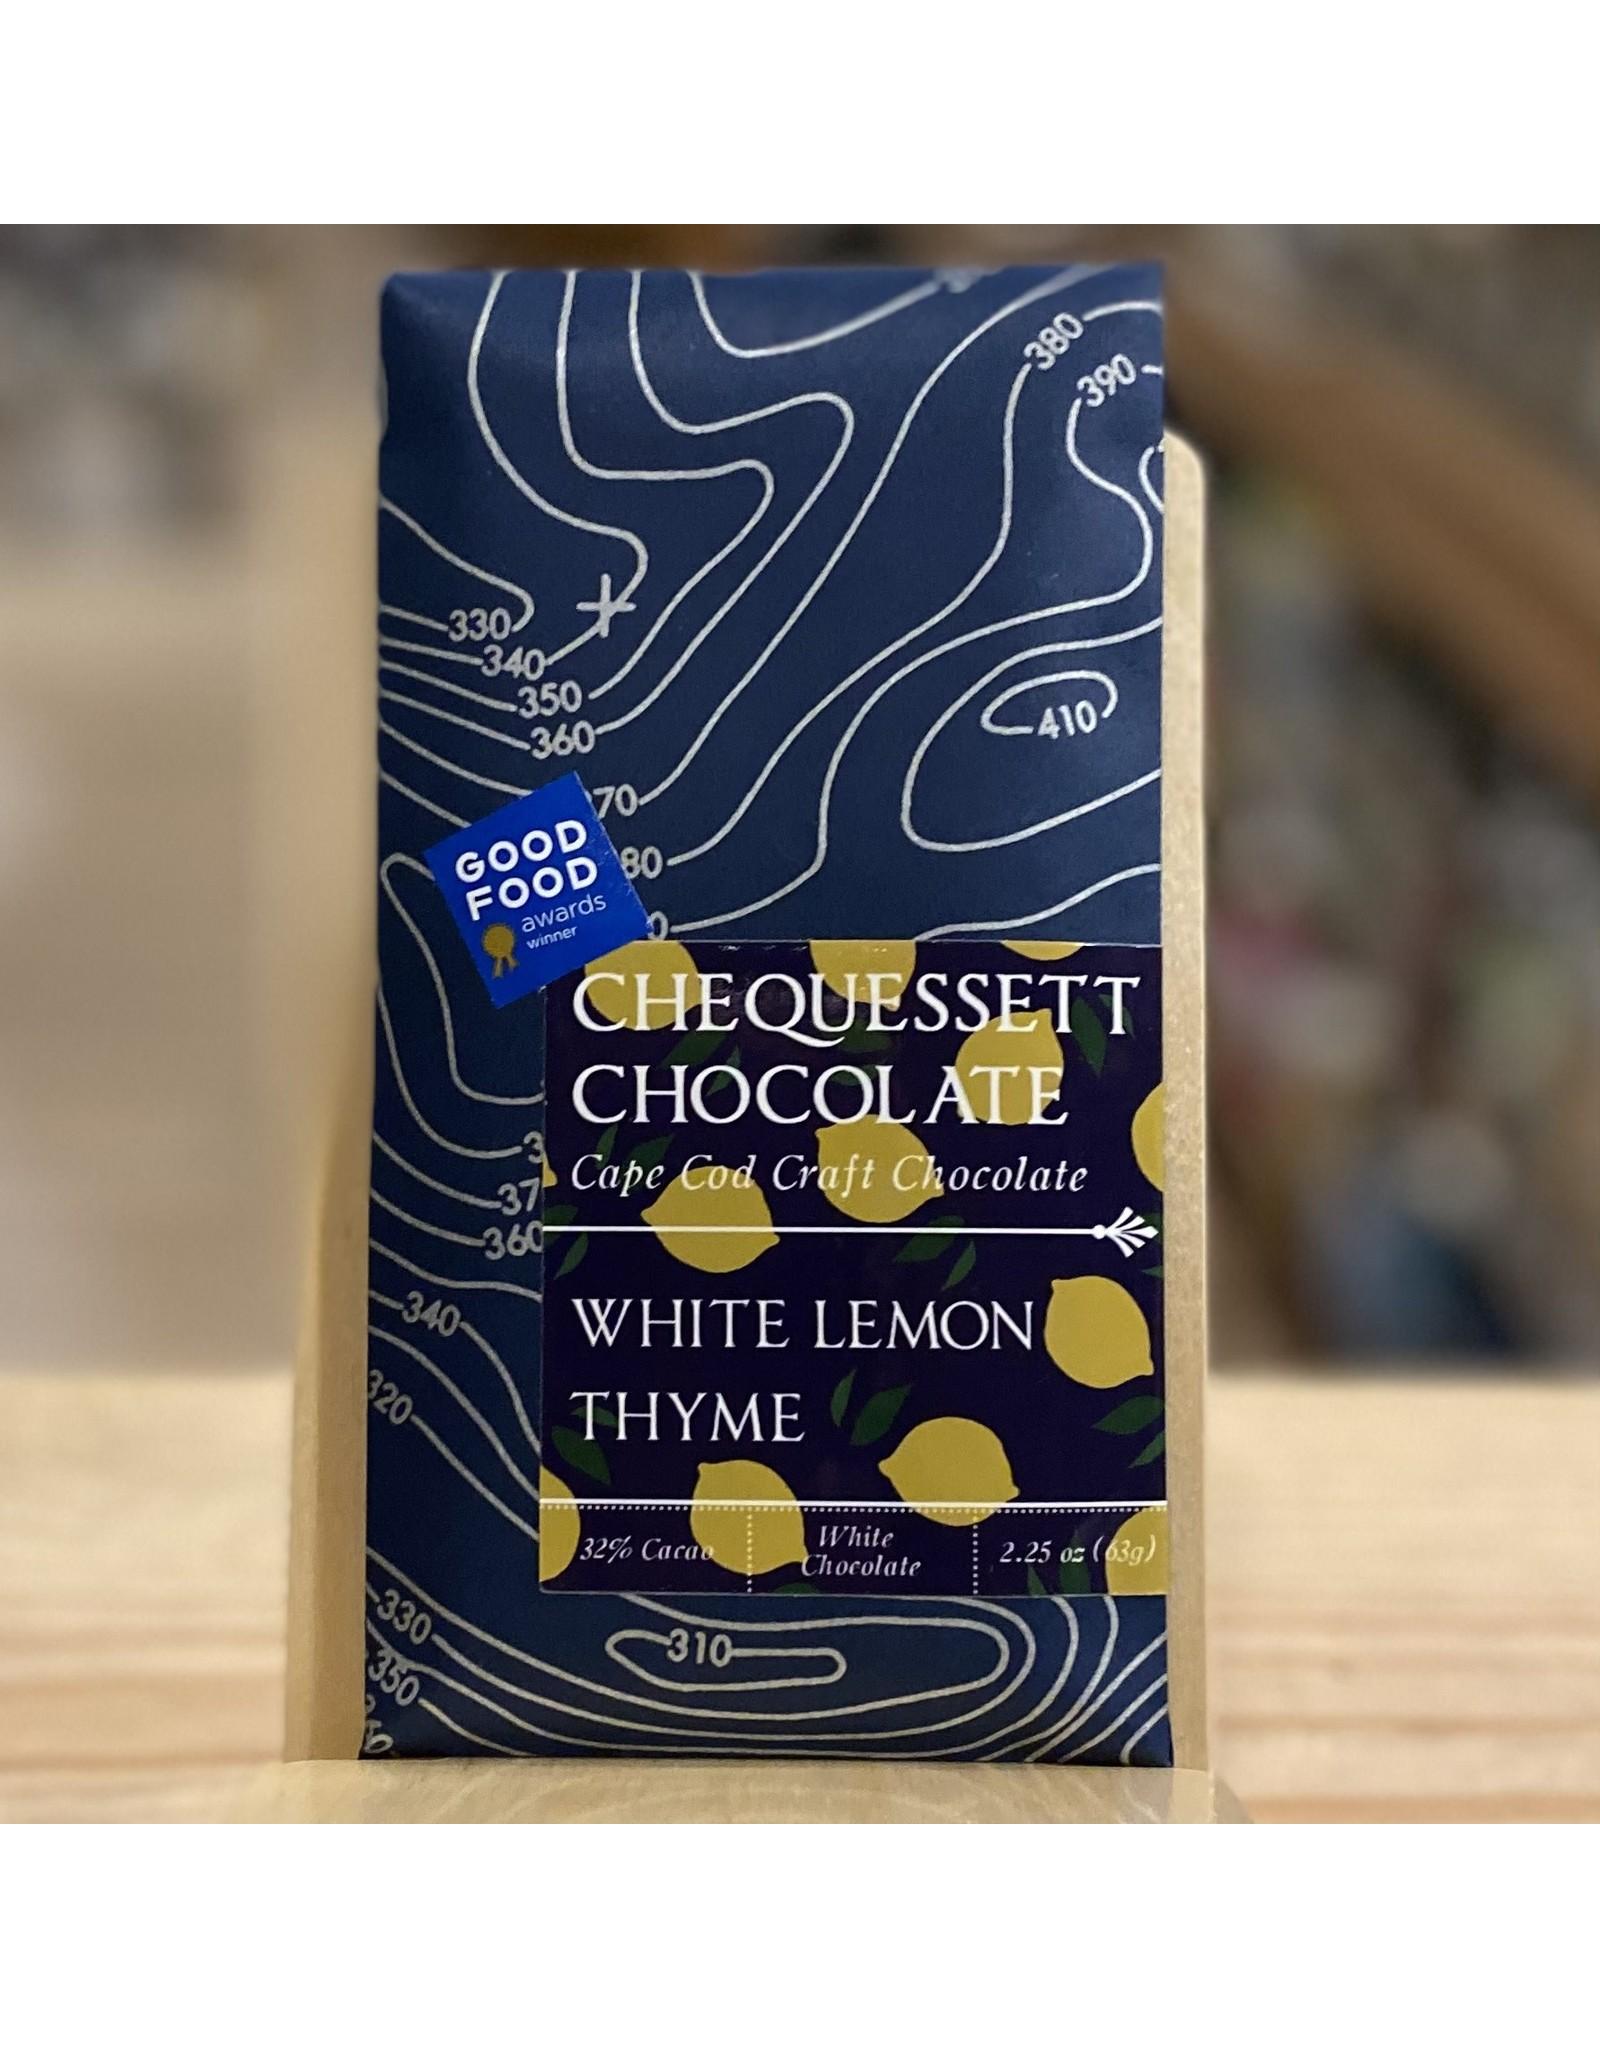 Chocolate Chequessett Chocolate White Chocolate w/Lemon and Thyme - North Truro, MA